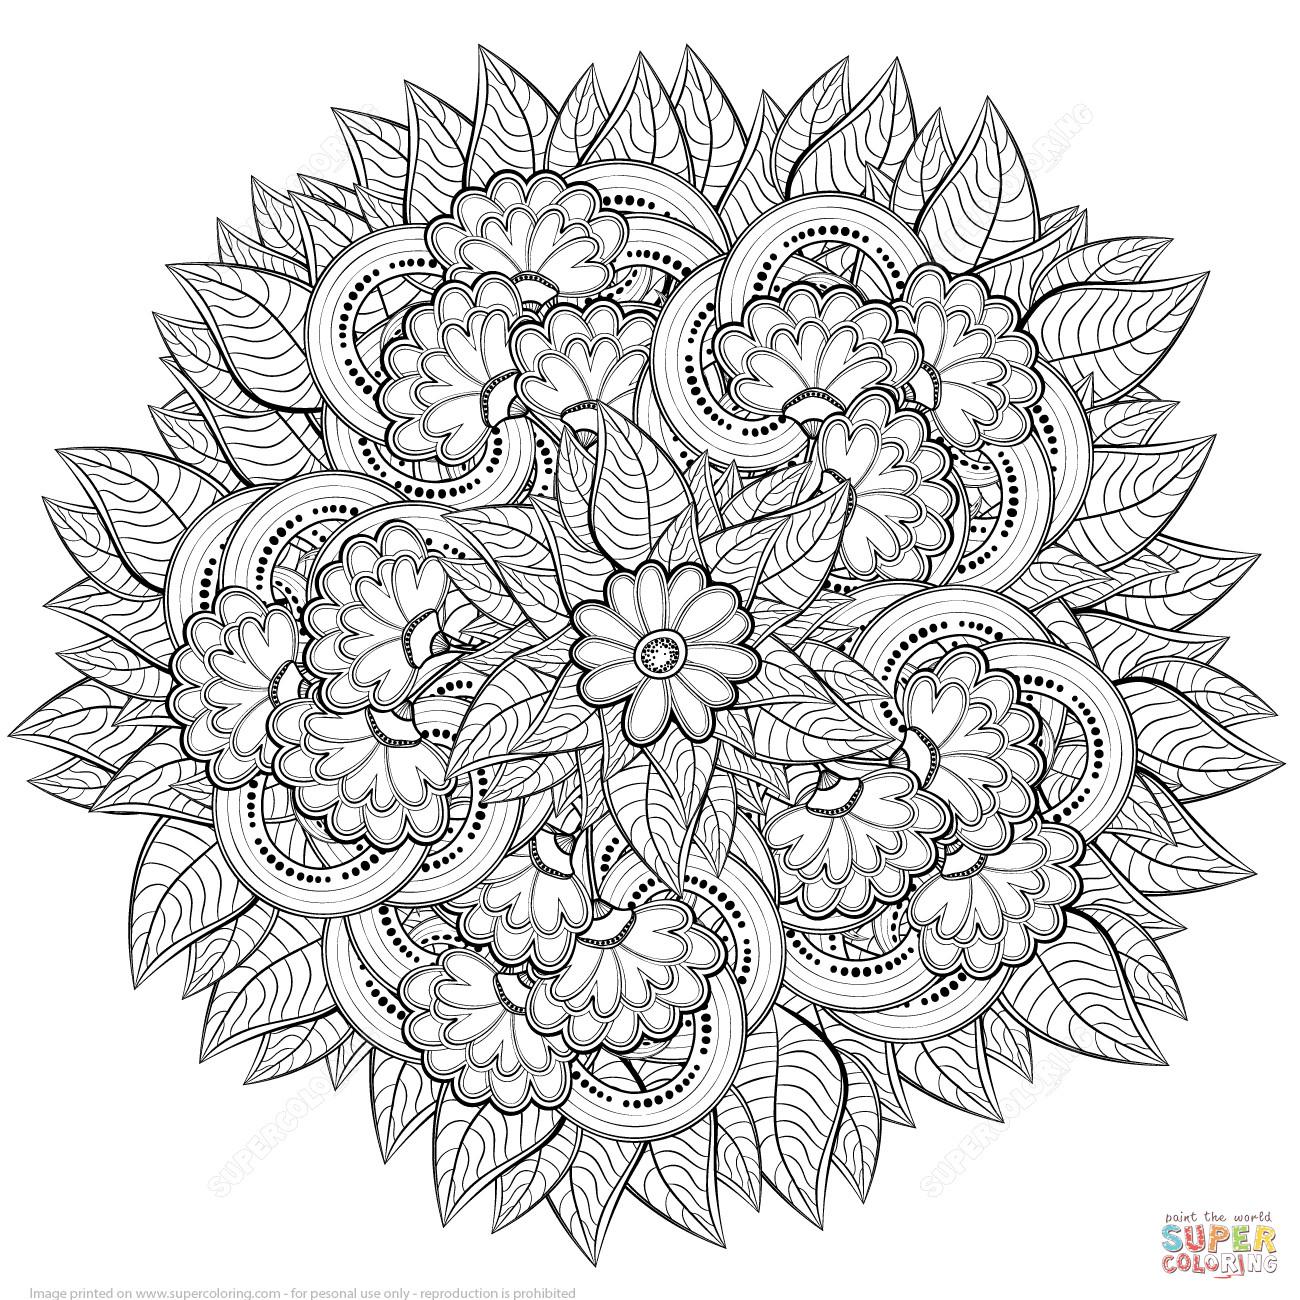 1300x1300 Zentangle Coloring Page Acpra